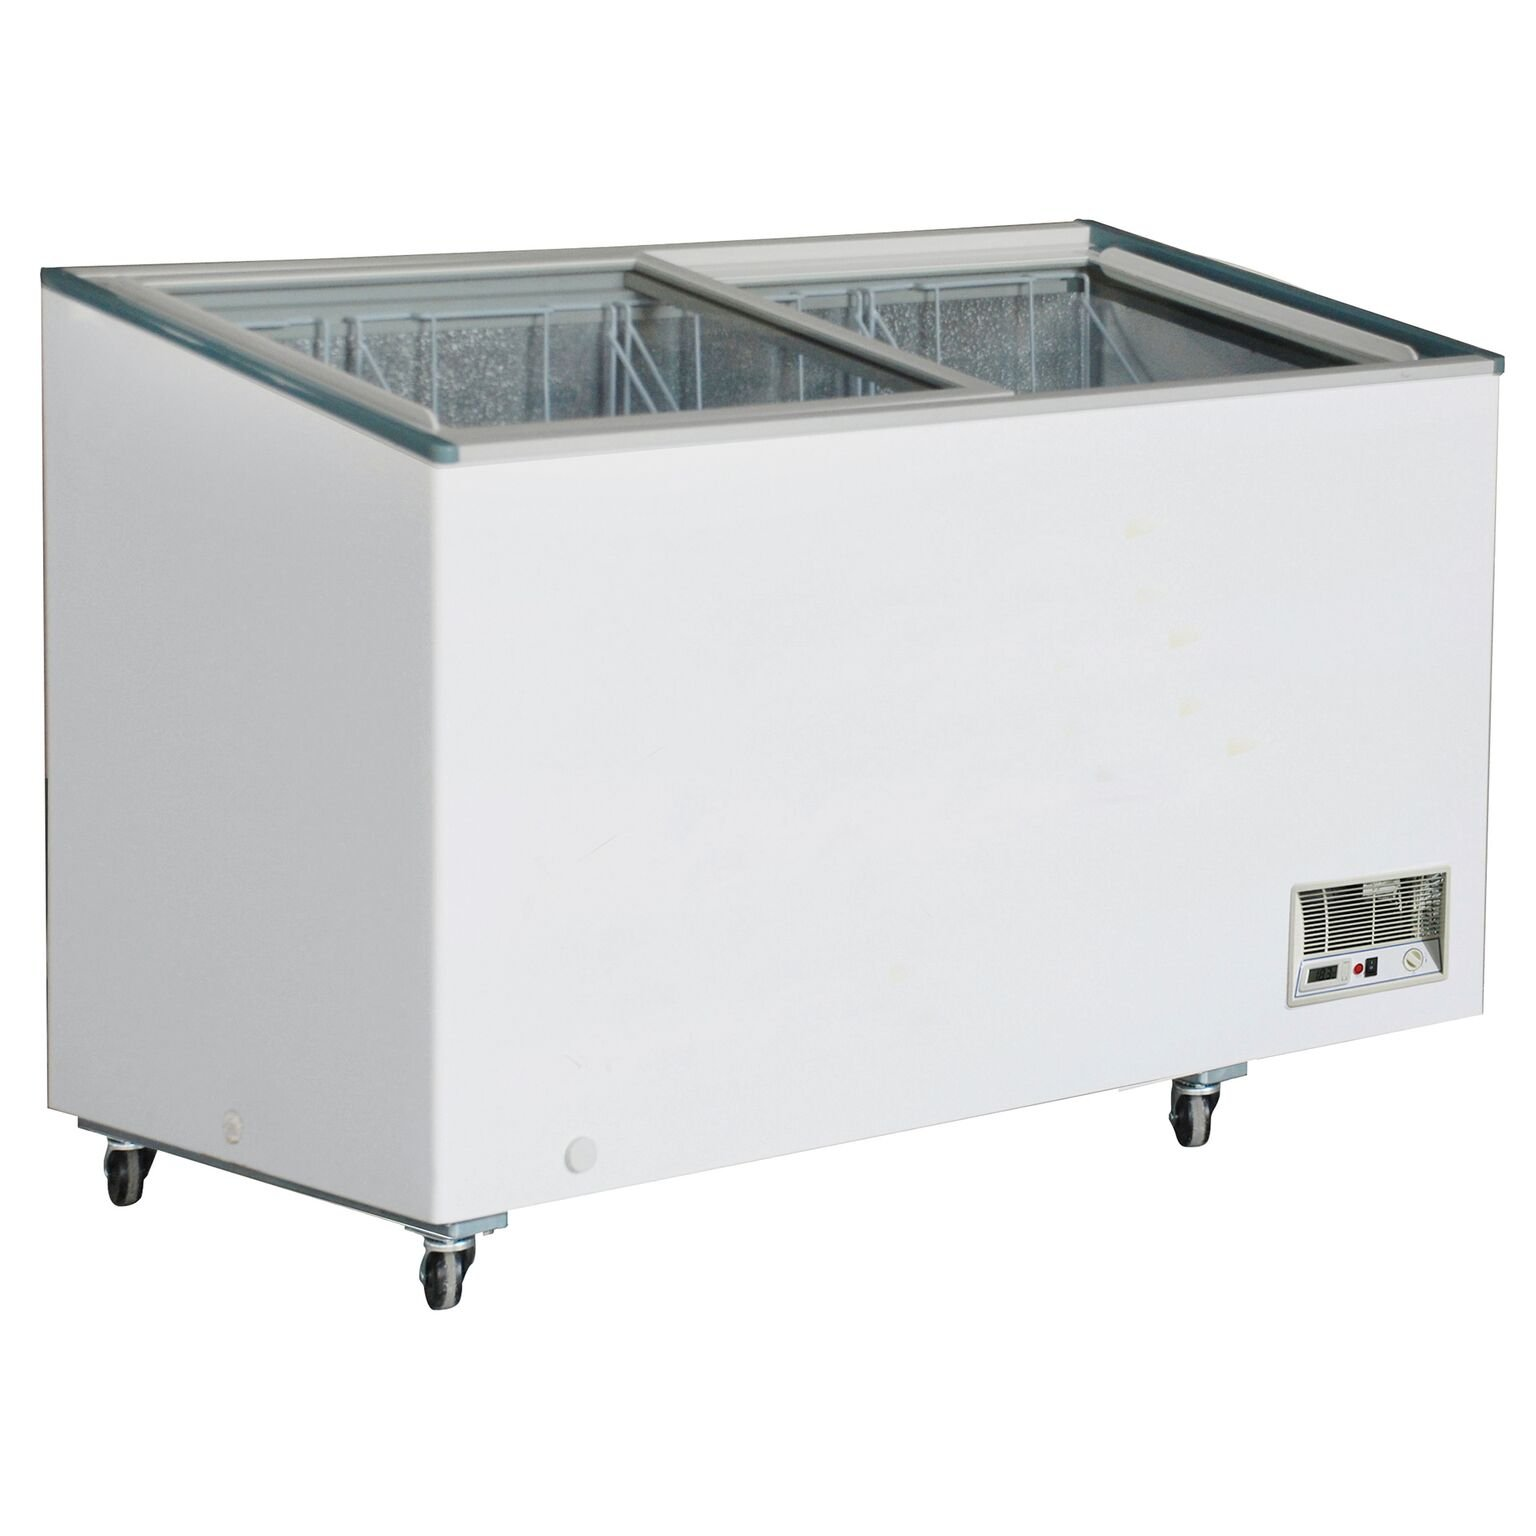 DUURA DVFD14.2 Flat Glass Display Freezer, White